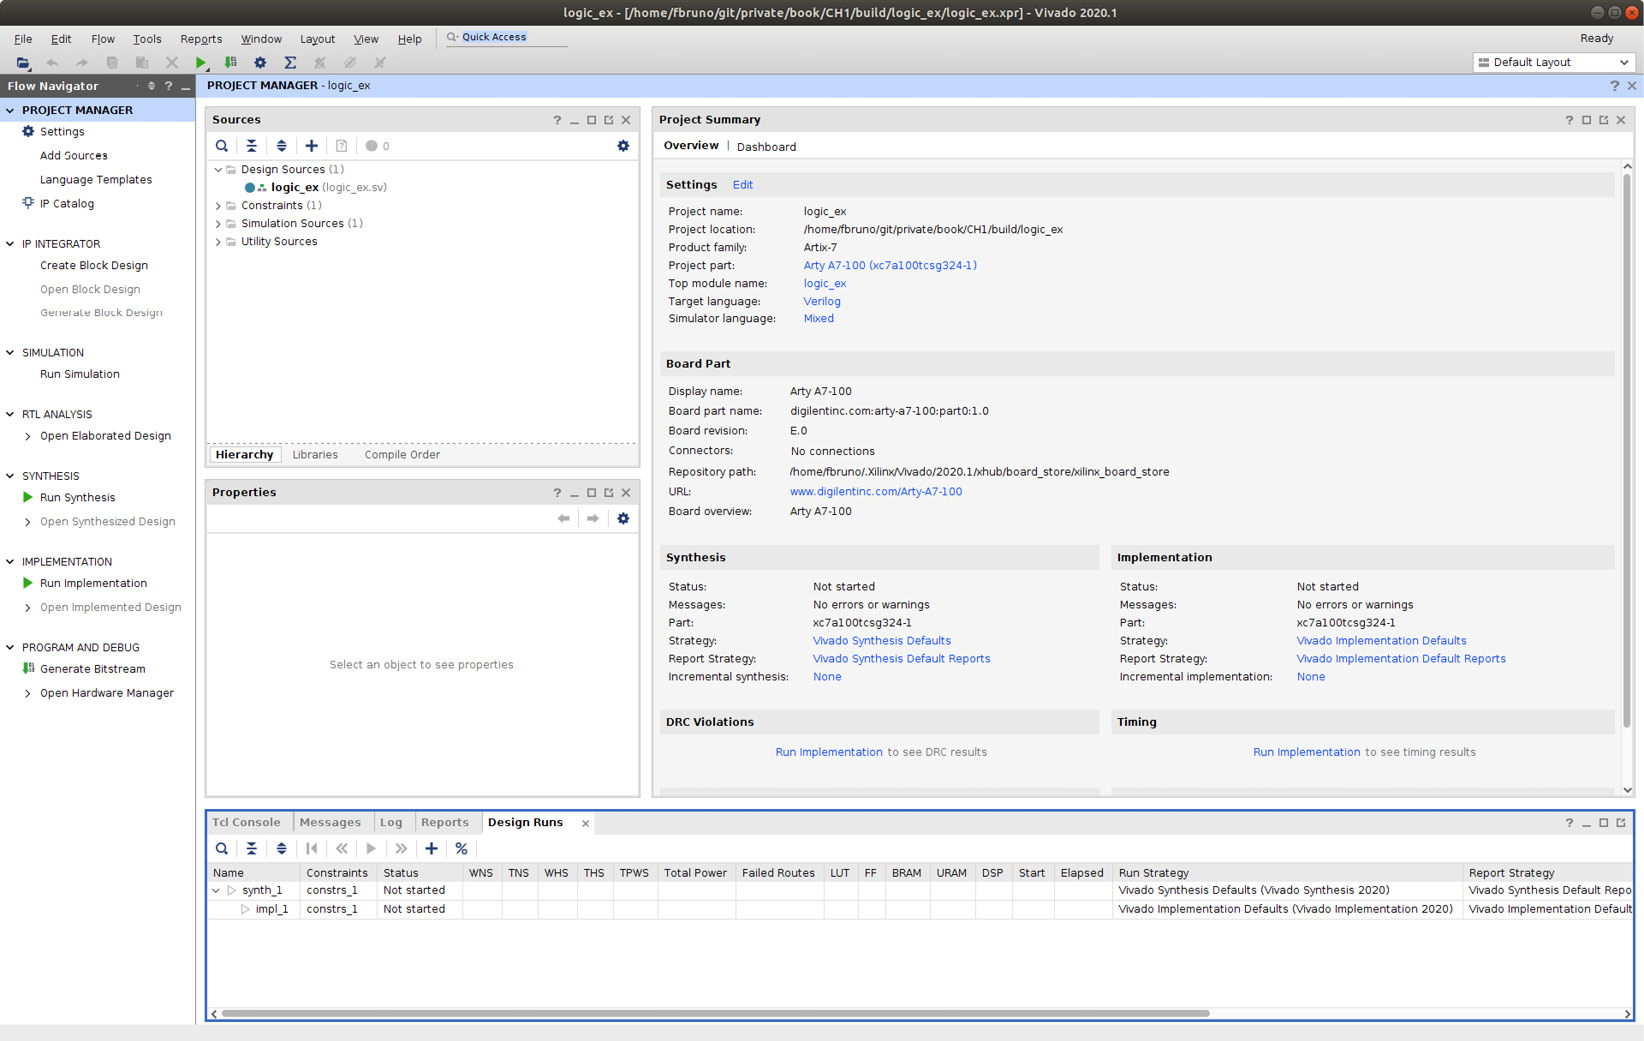 Figure 1.17 – Vivado main screen for the logic_ex project